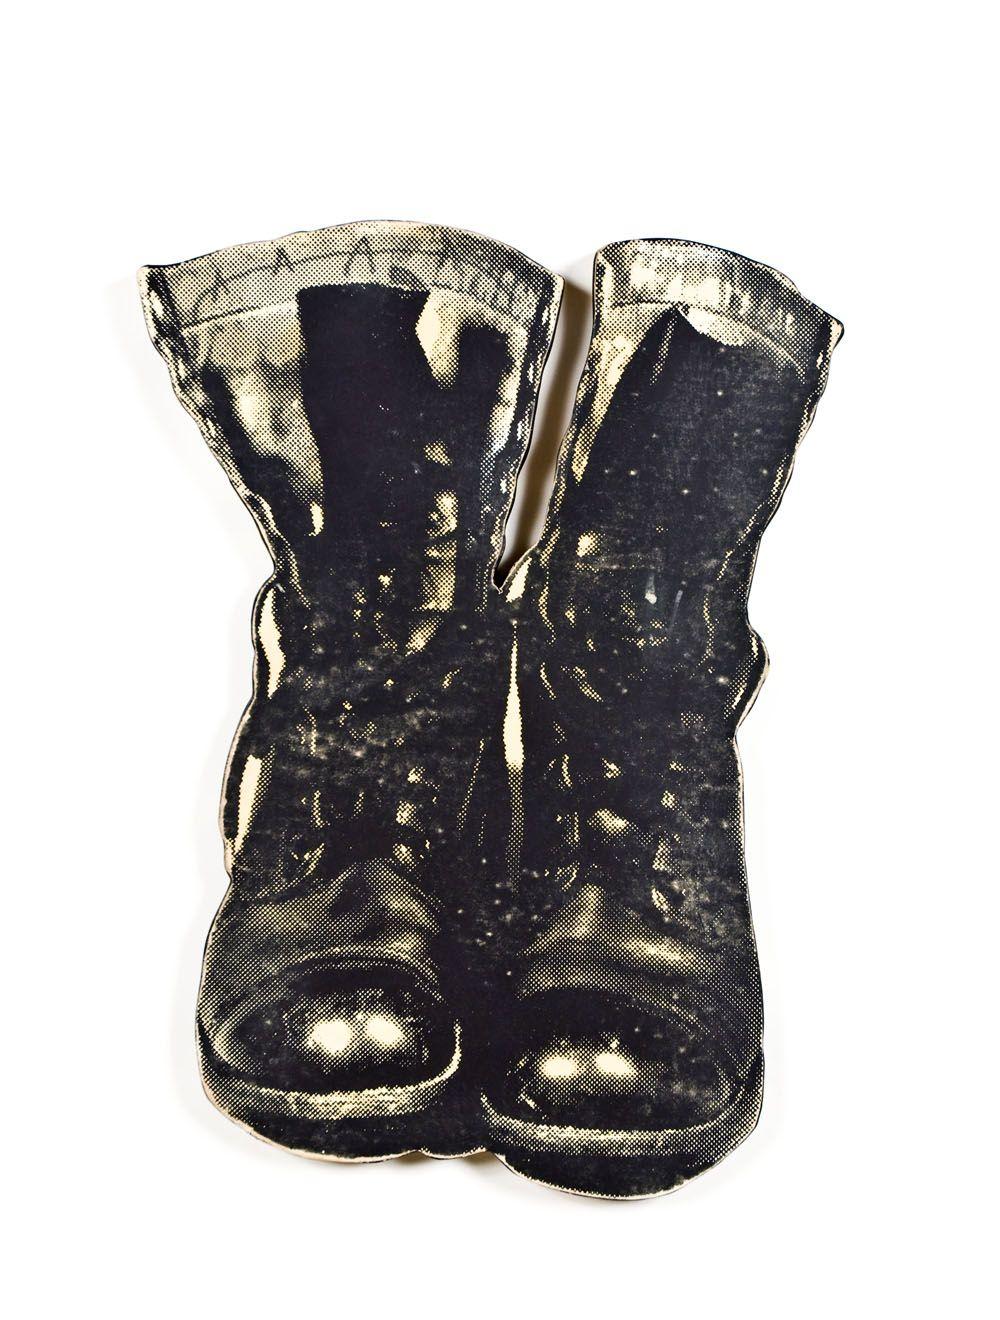 SKYLAR FEIN Alison's Combat Boots, 2011